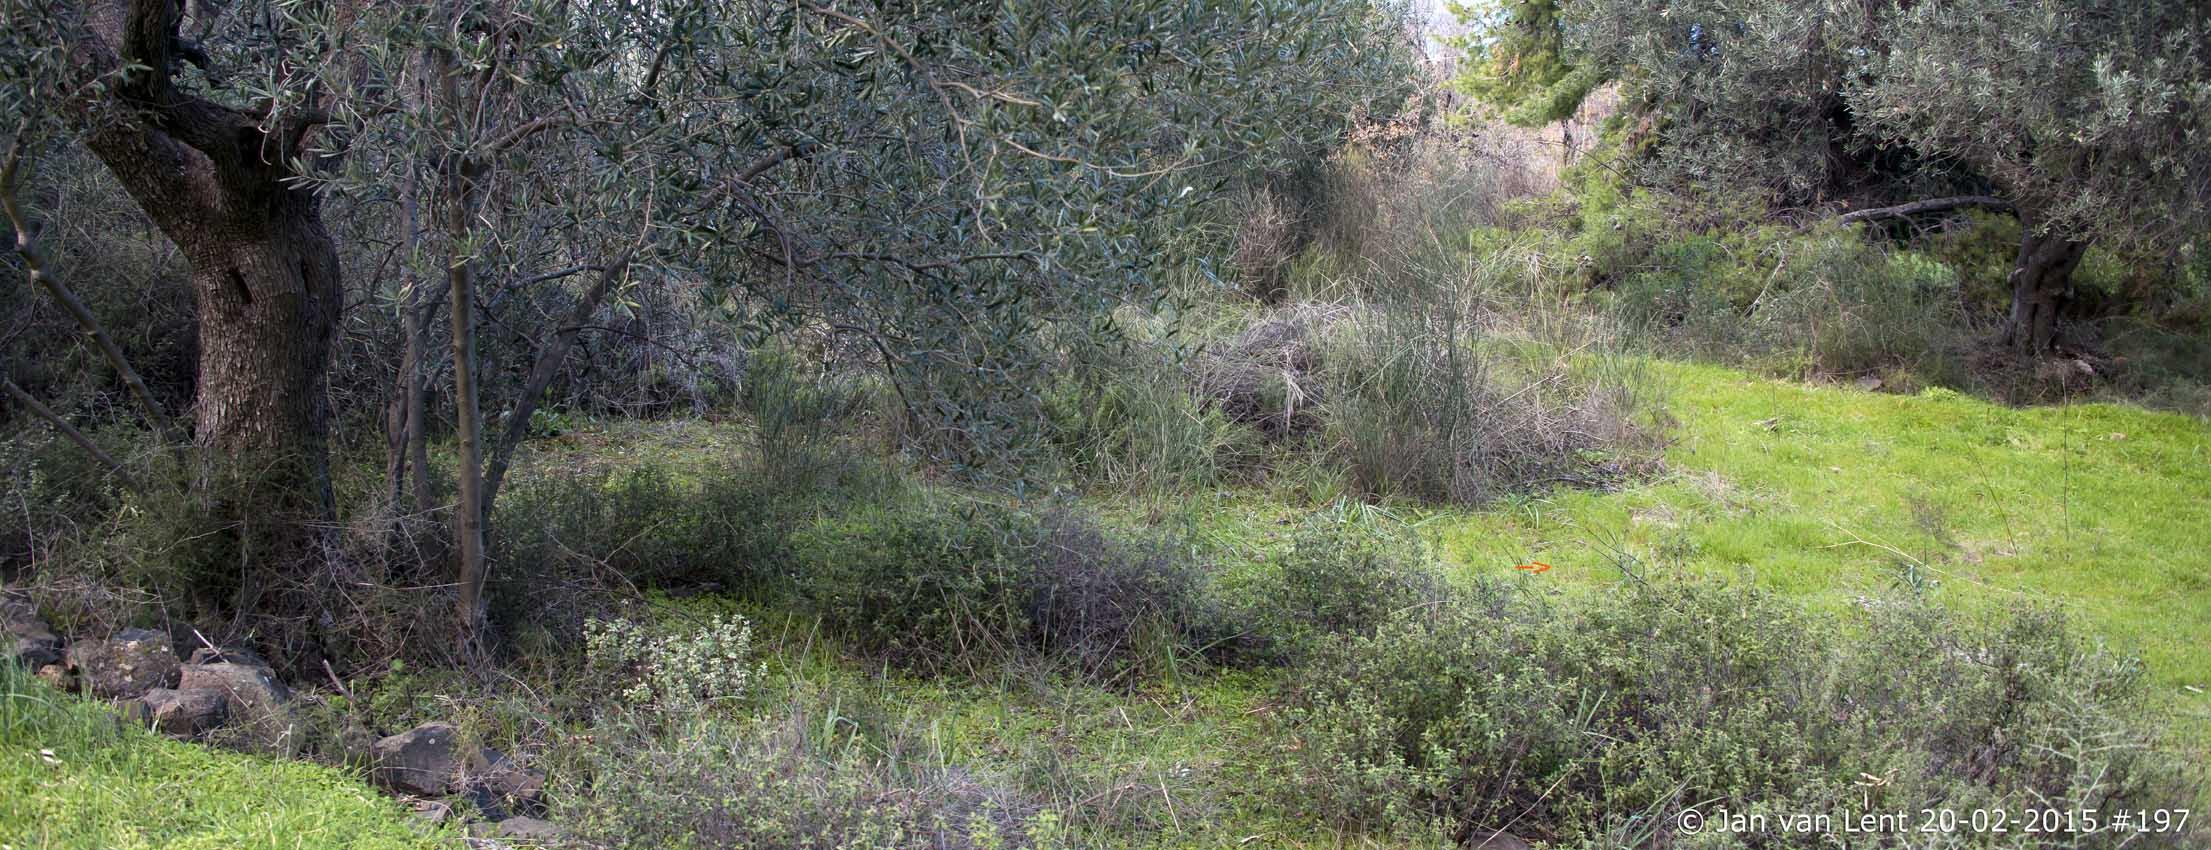 Habitat 1e Ophrys sicula Eftalou © Jan van Lent, 20-02-2015 #197